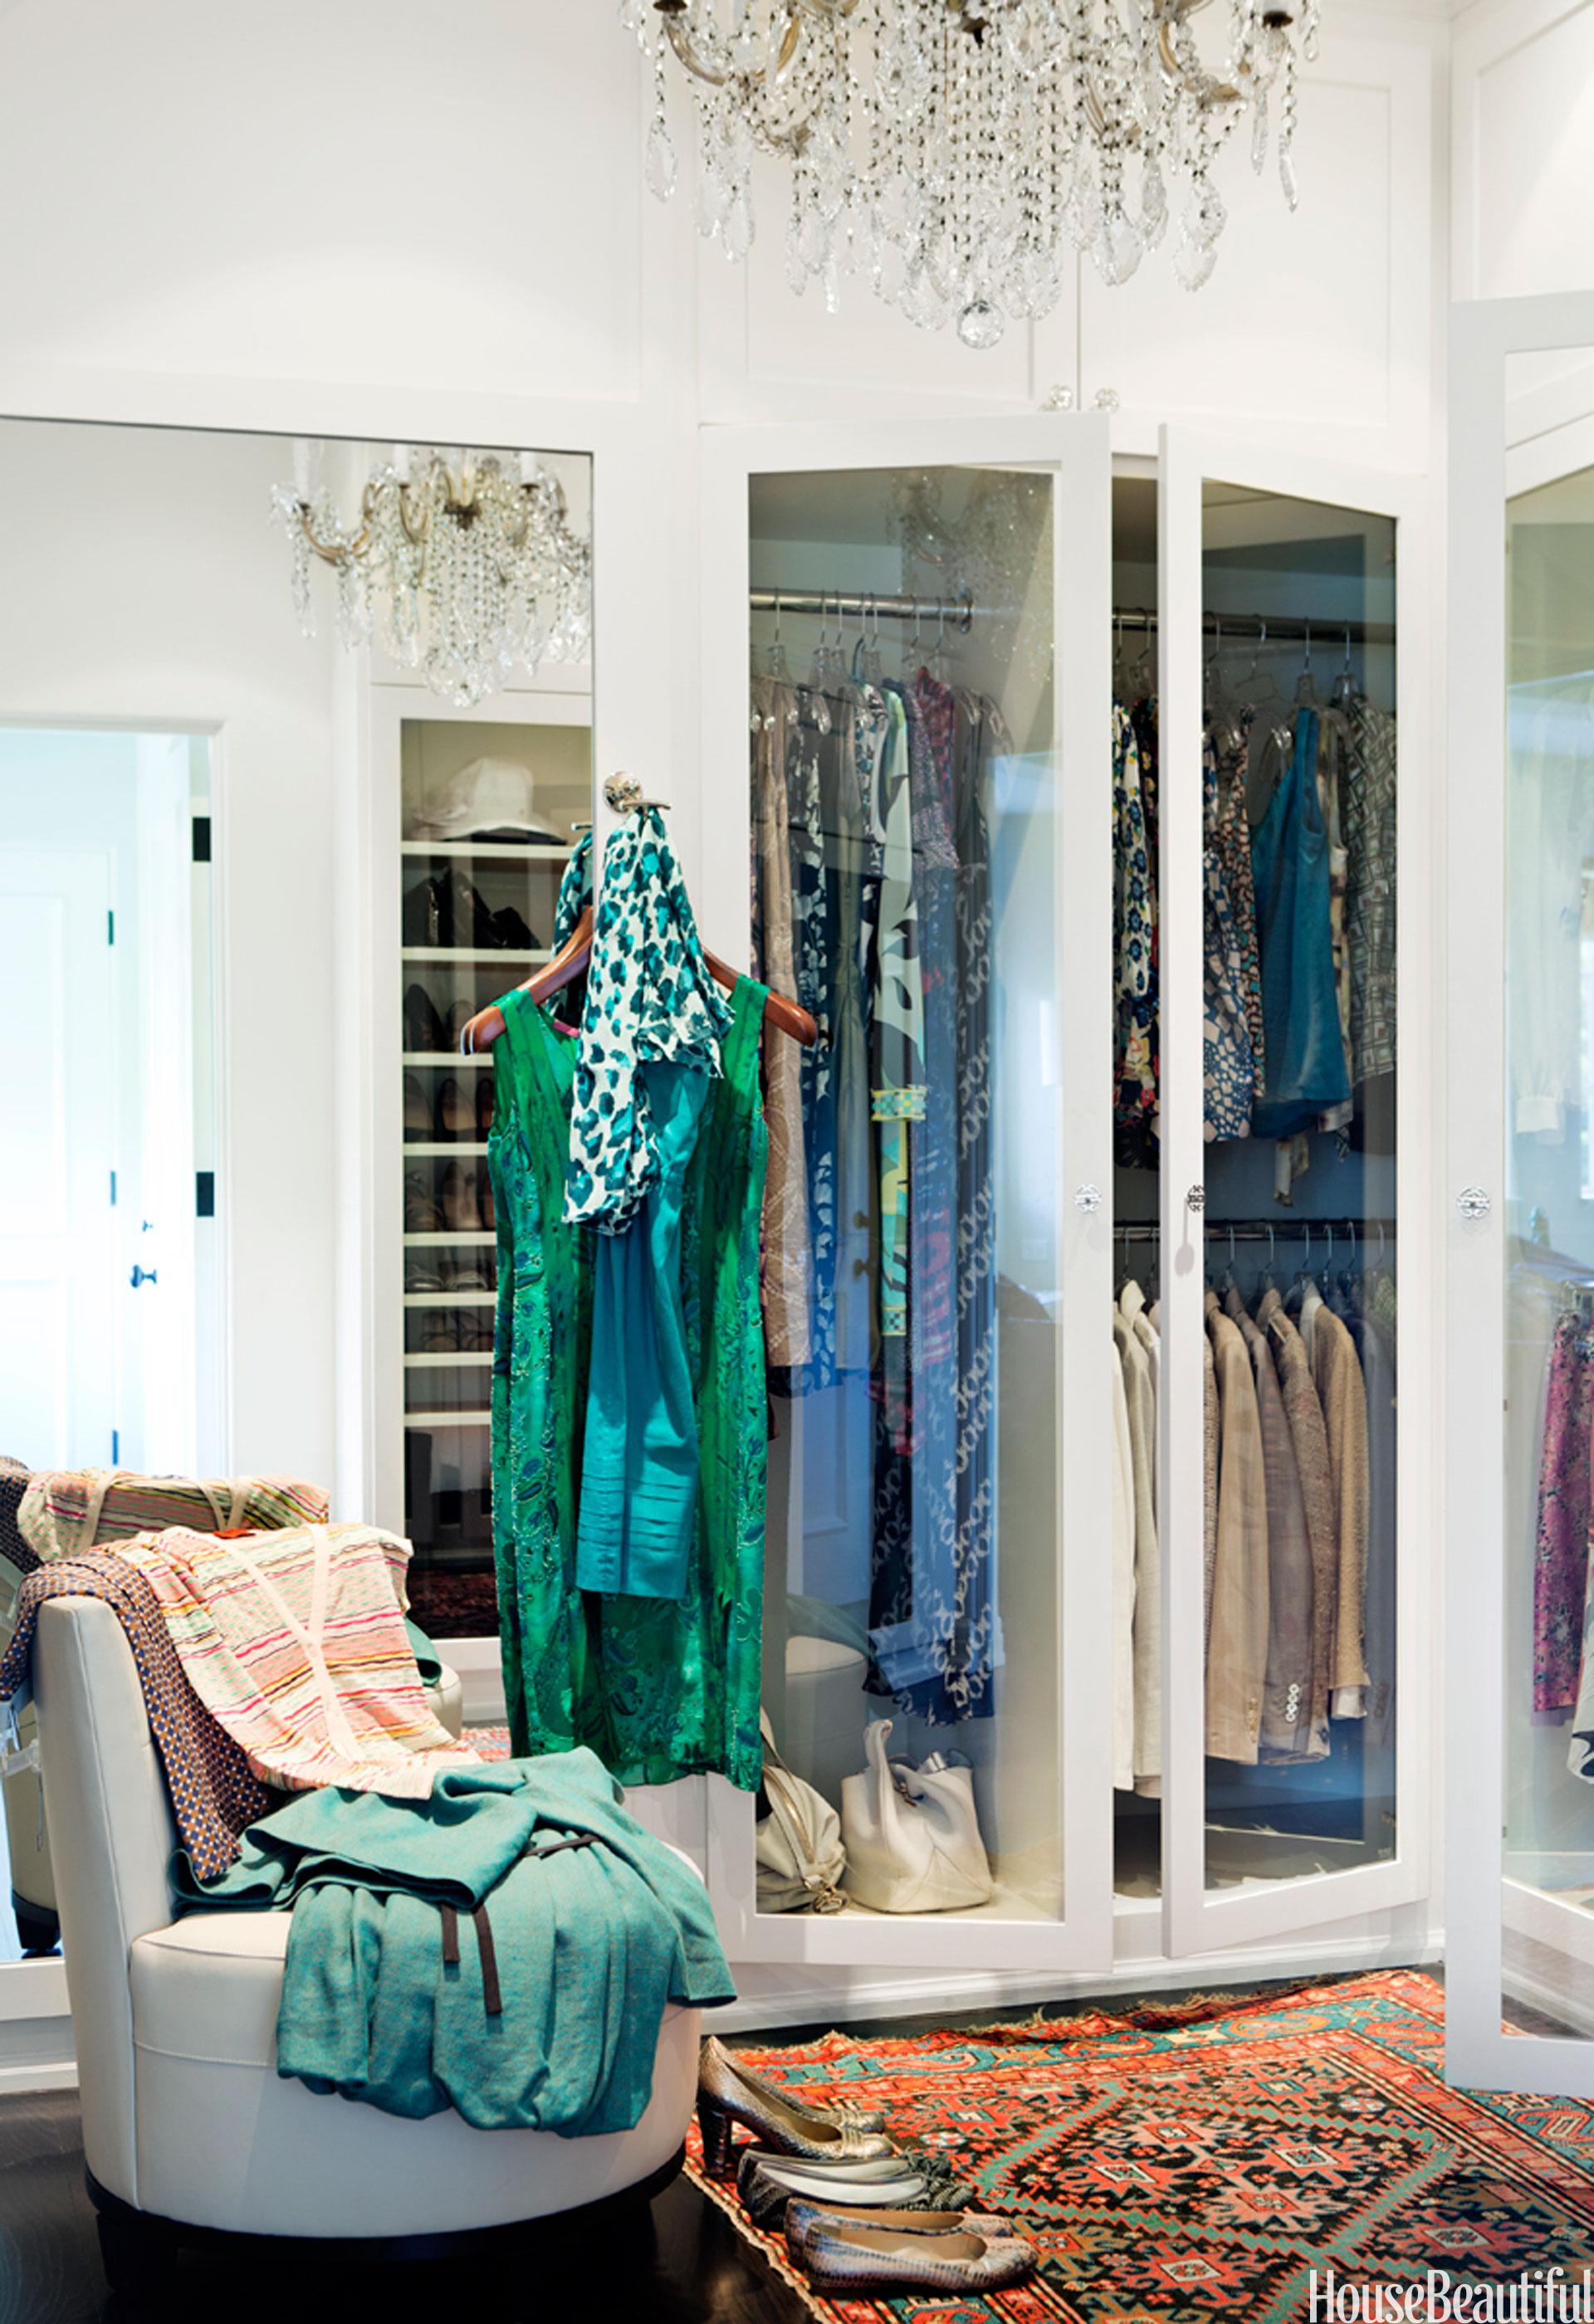 Best Dressing Room Design: Dream Dressing Room Photos